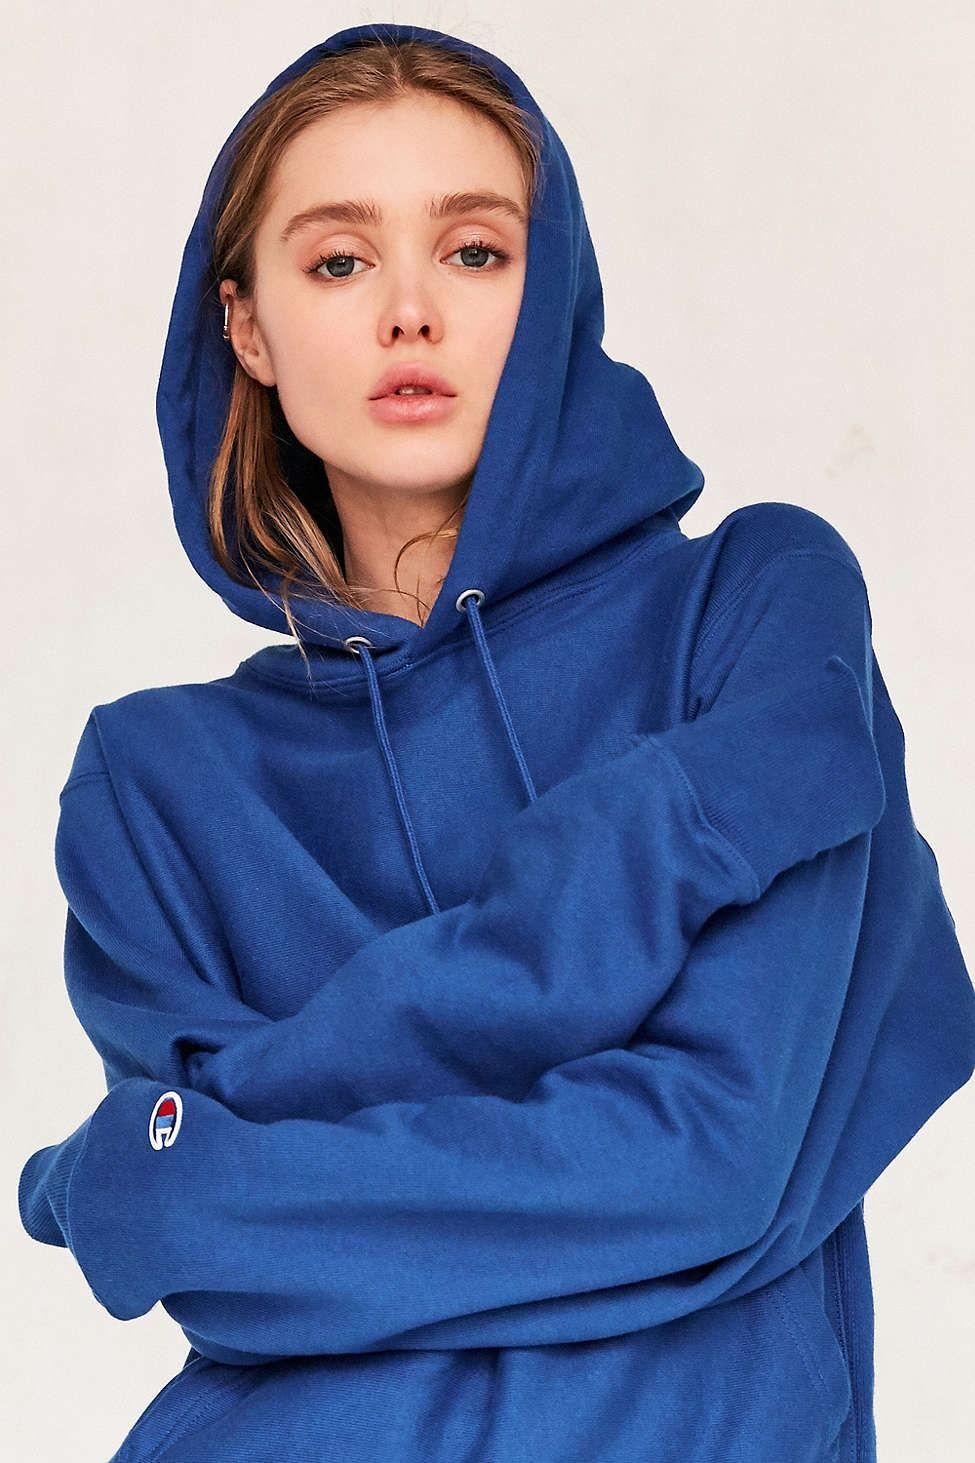 a1a719e65840 Champion Reverse Weave Hoodie Sweatshirt - Urban Outfitters Zimní Móda